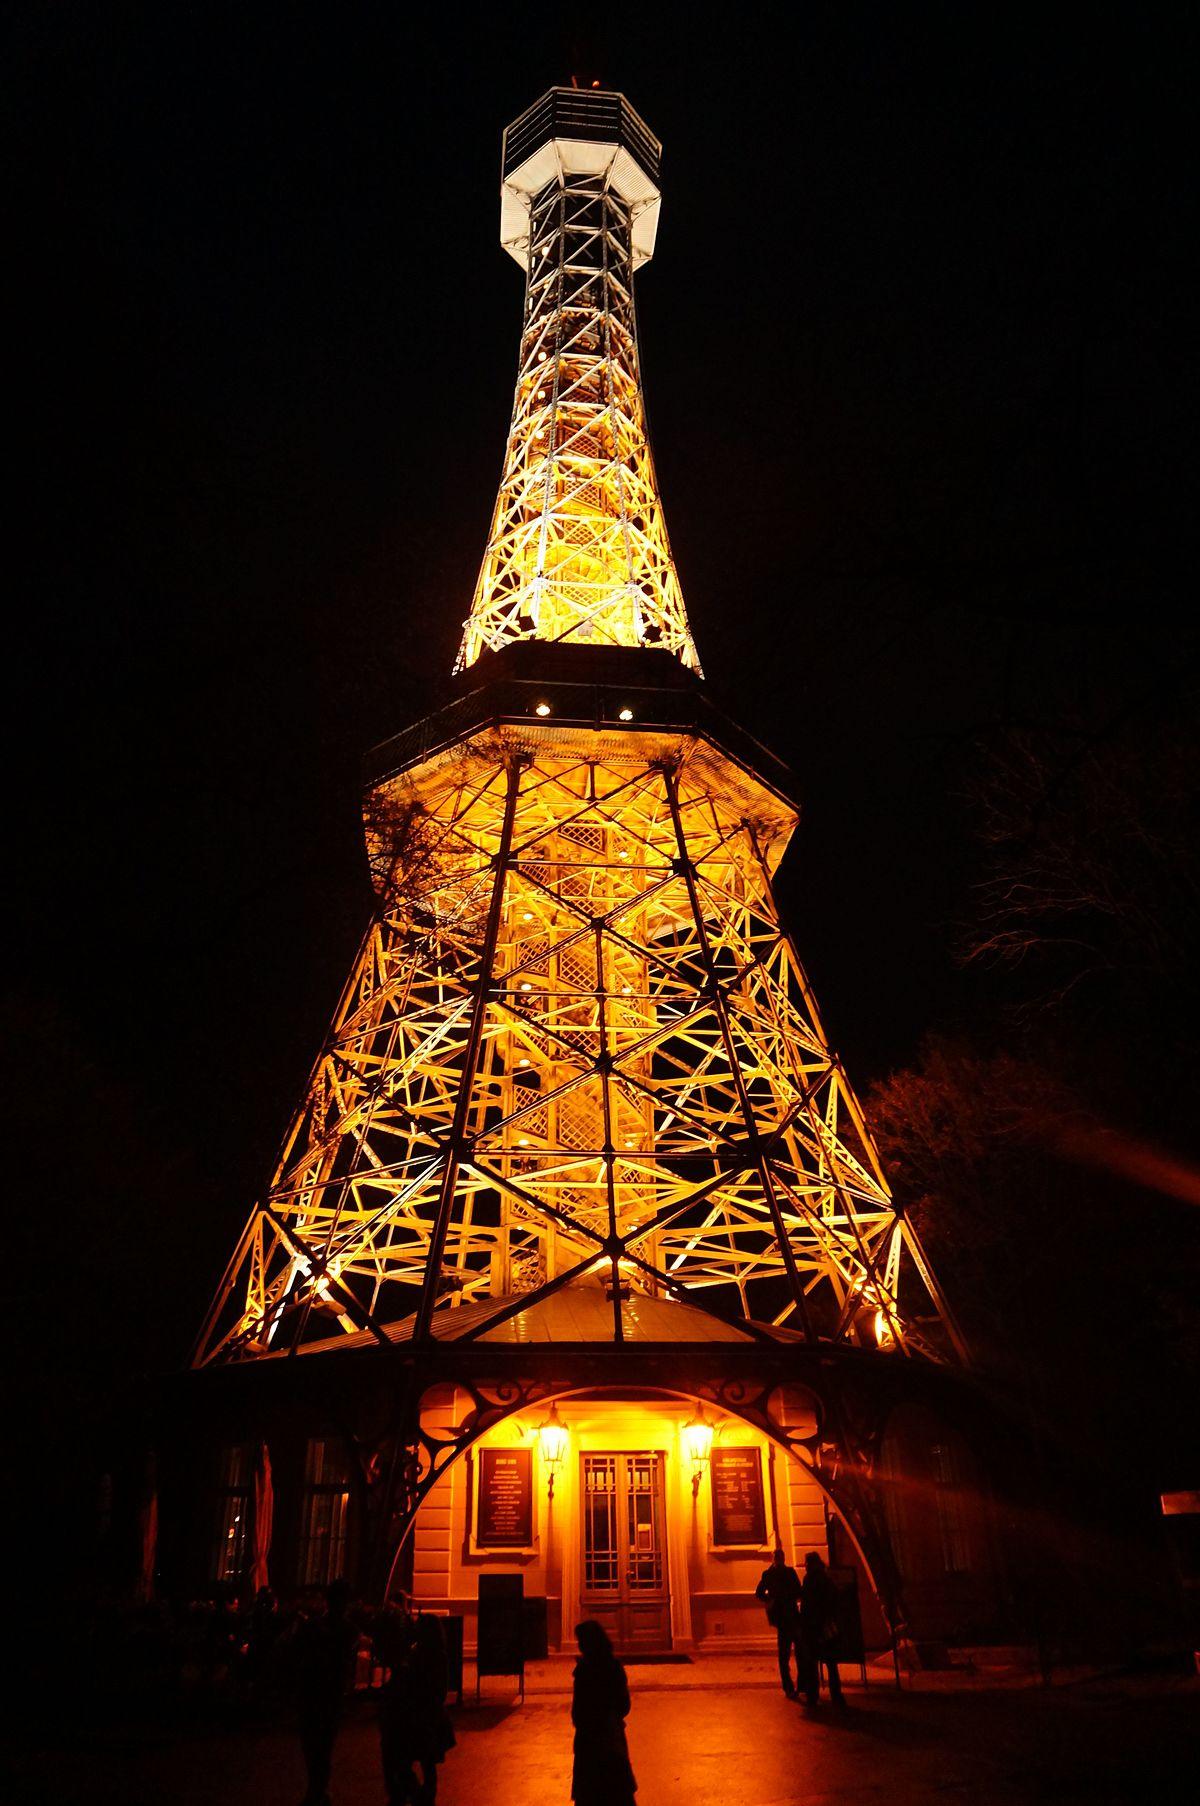 Petř 237 N Lookout Tower Wikipedia